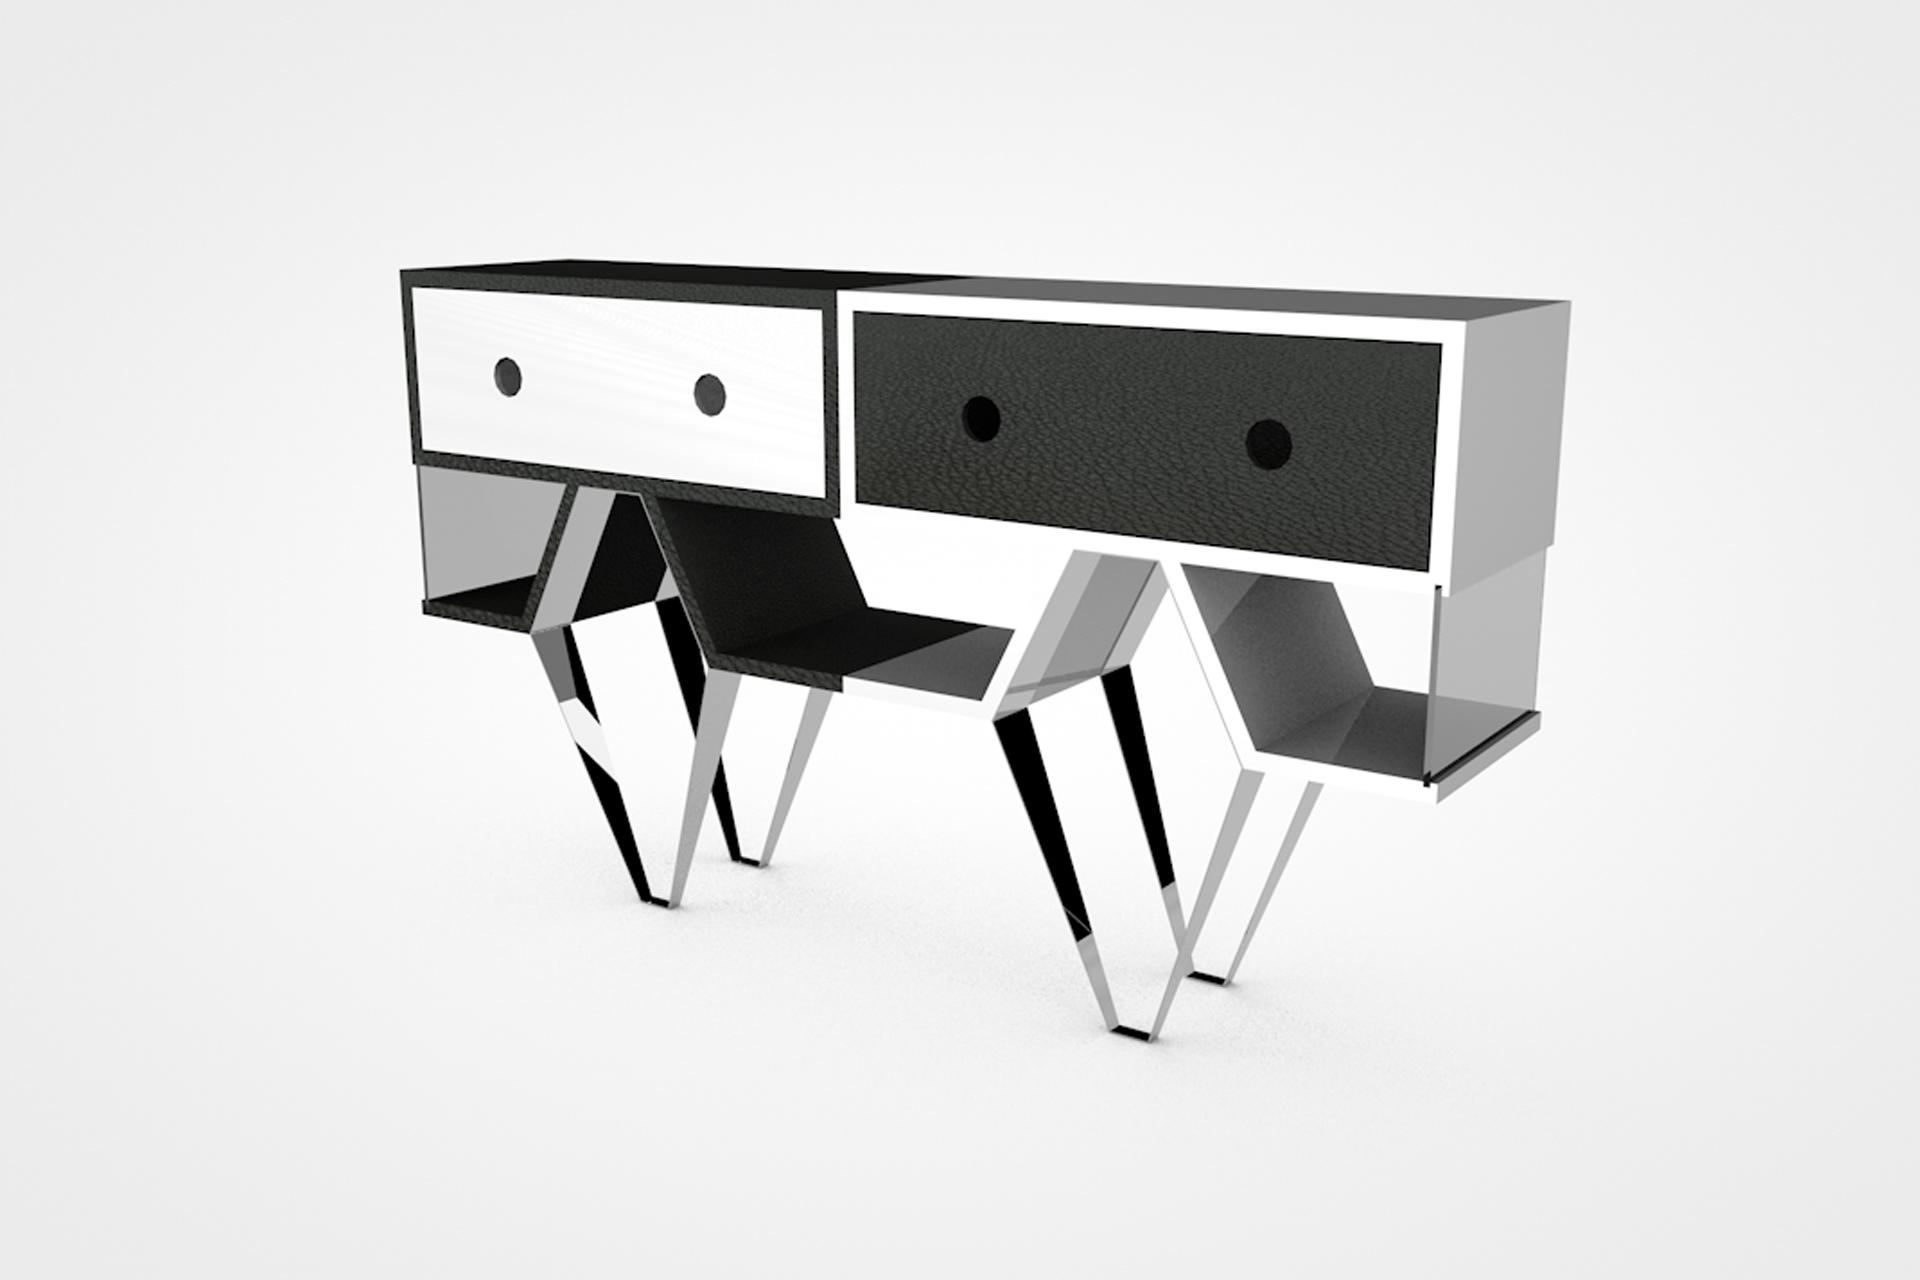 duo-robot_imm_01